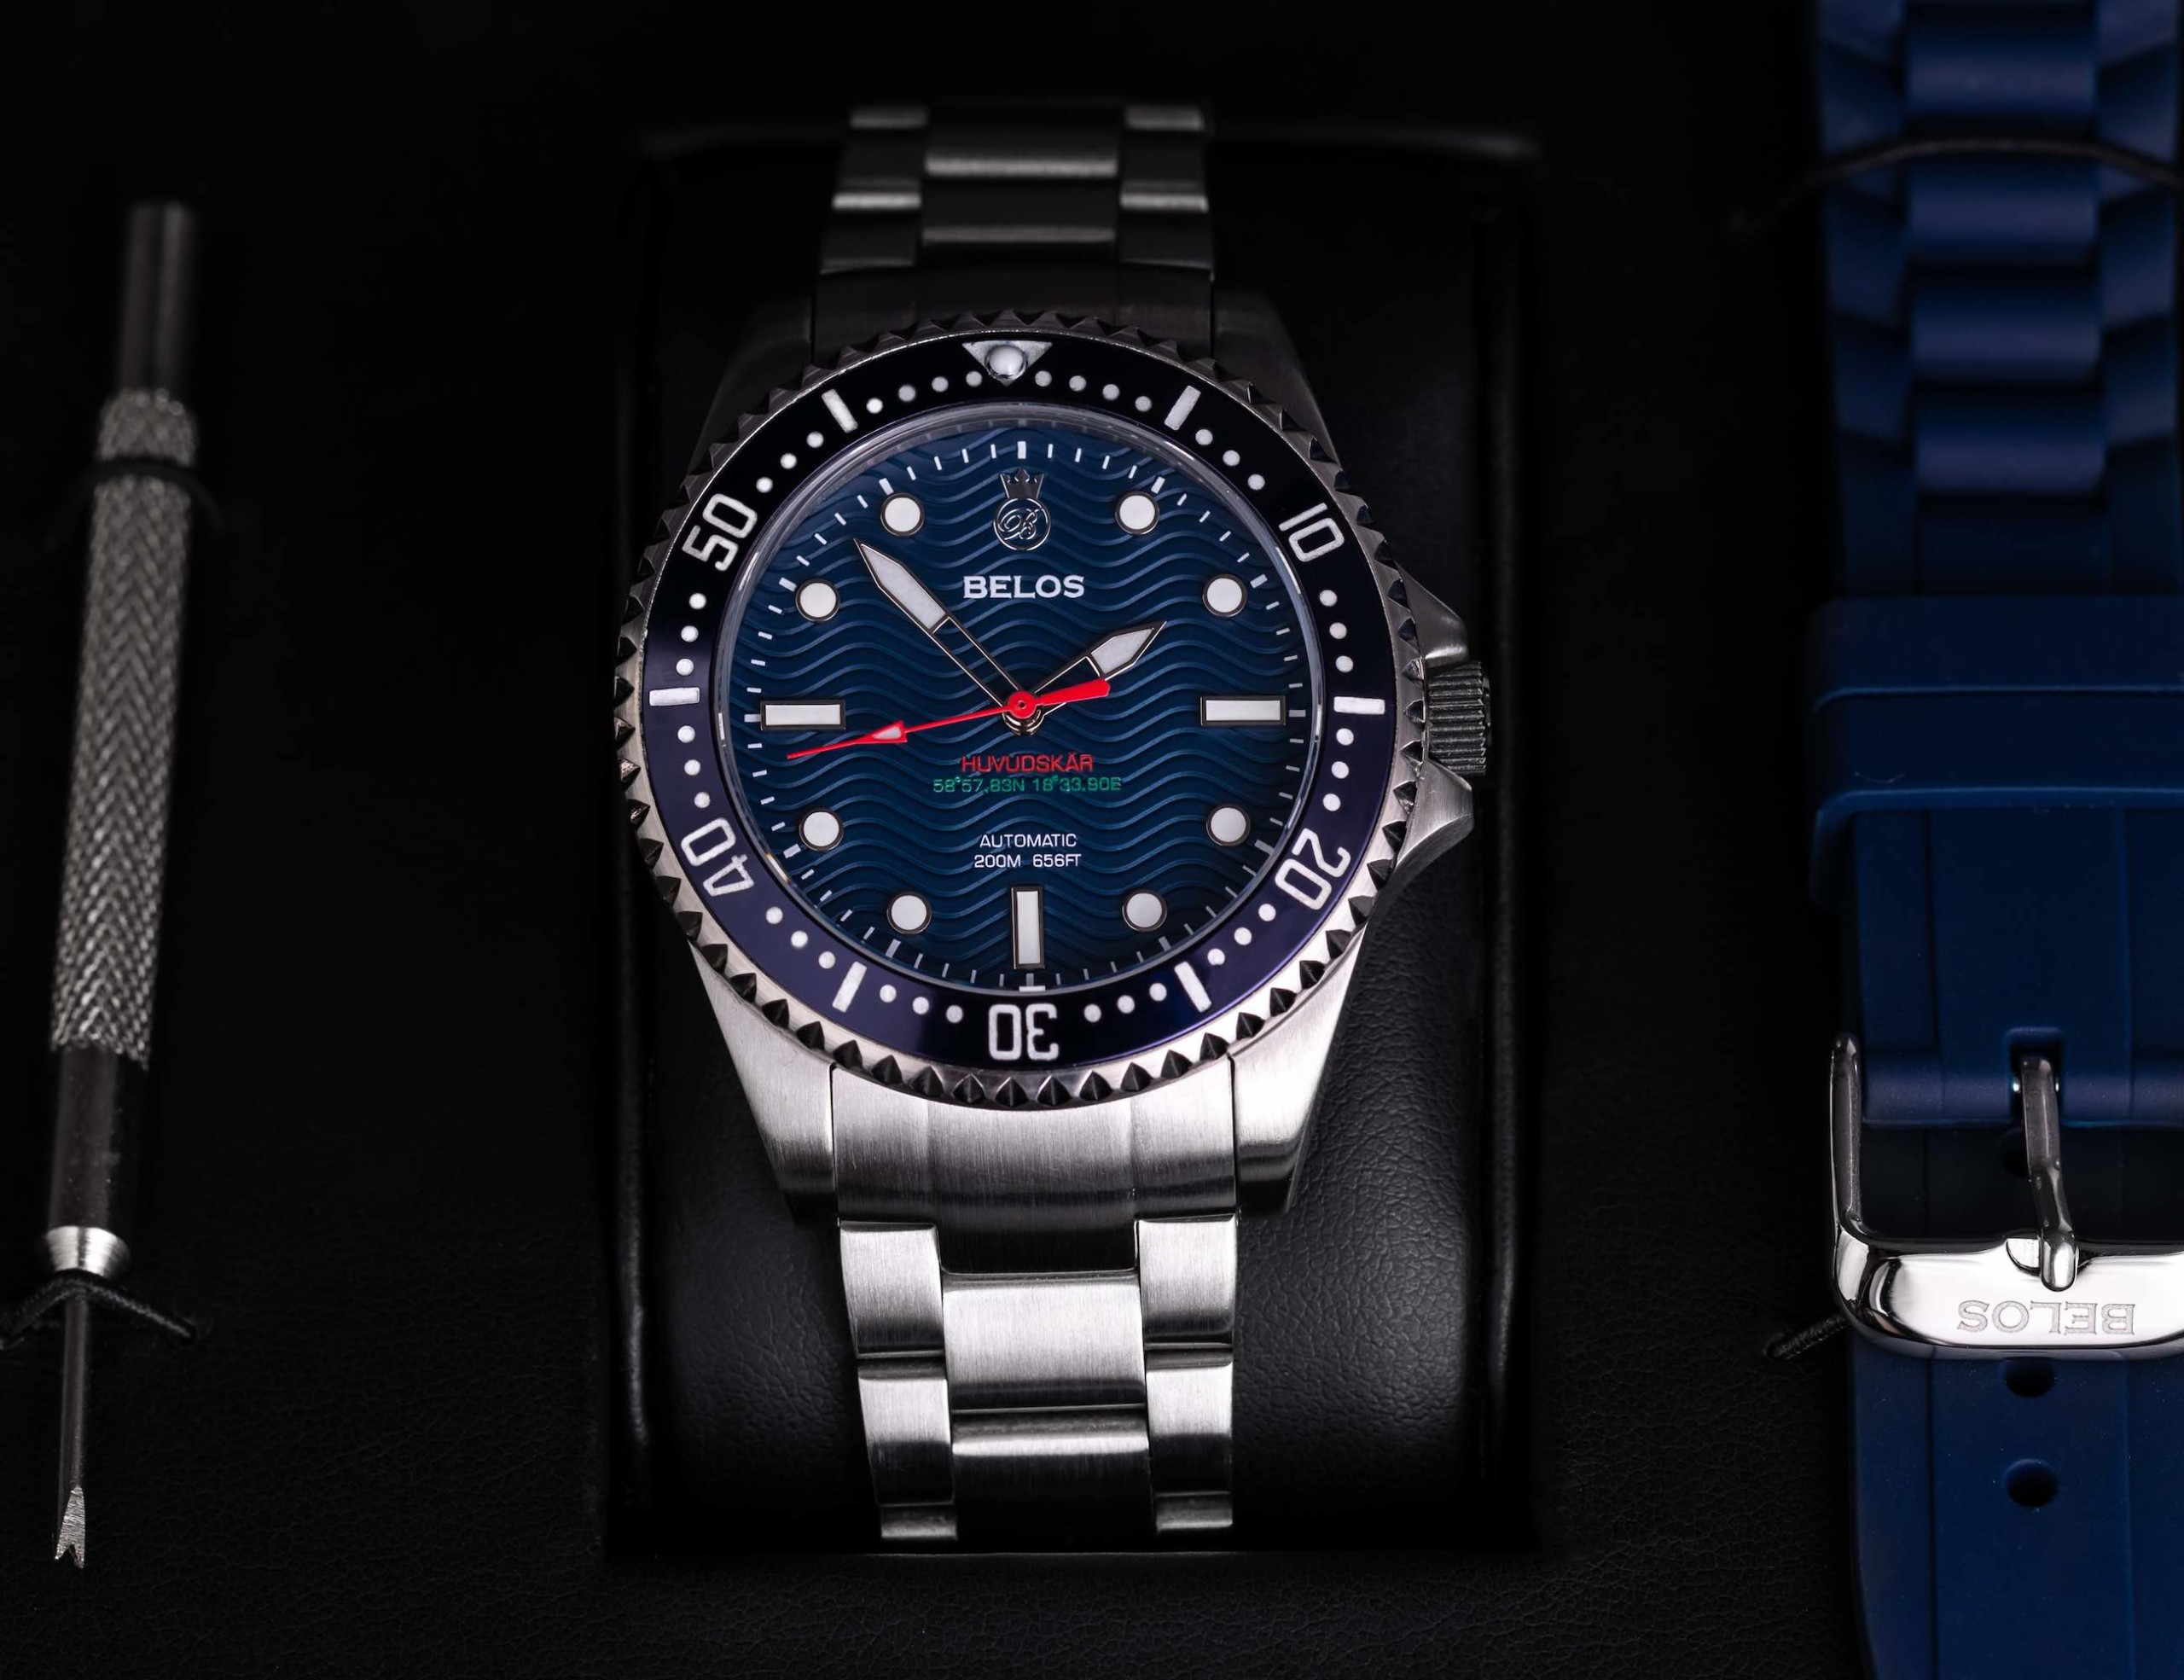 Huvudskär Automatic 40 Swedish Dive Watches